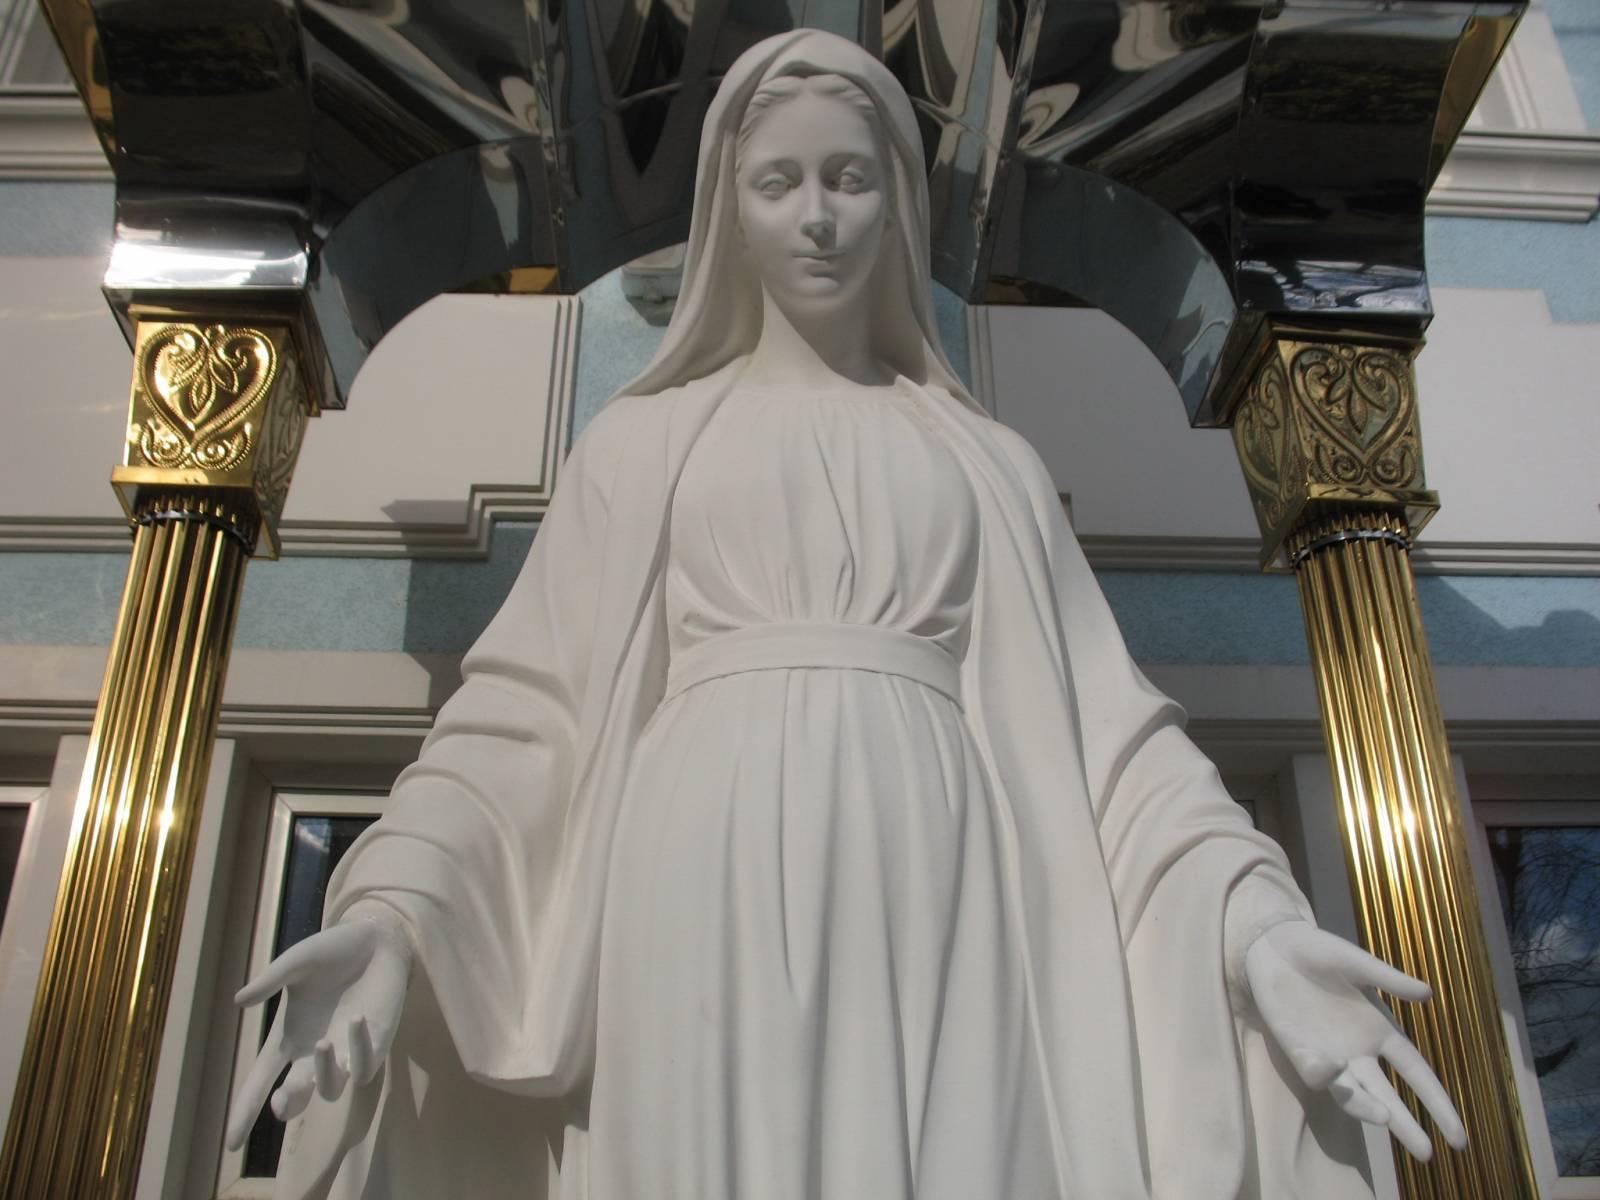 Прикарпатець намагався викрасти Матір Божу